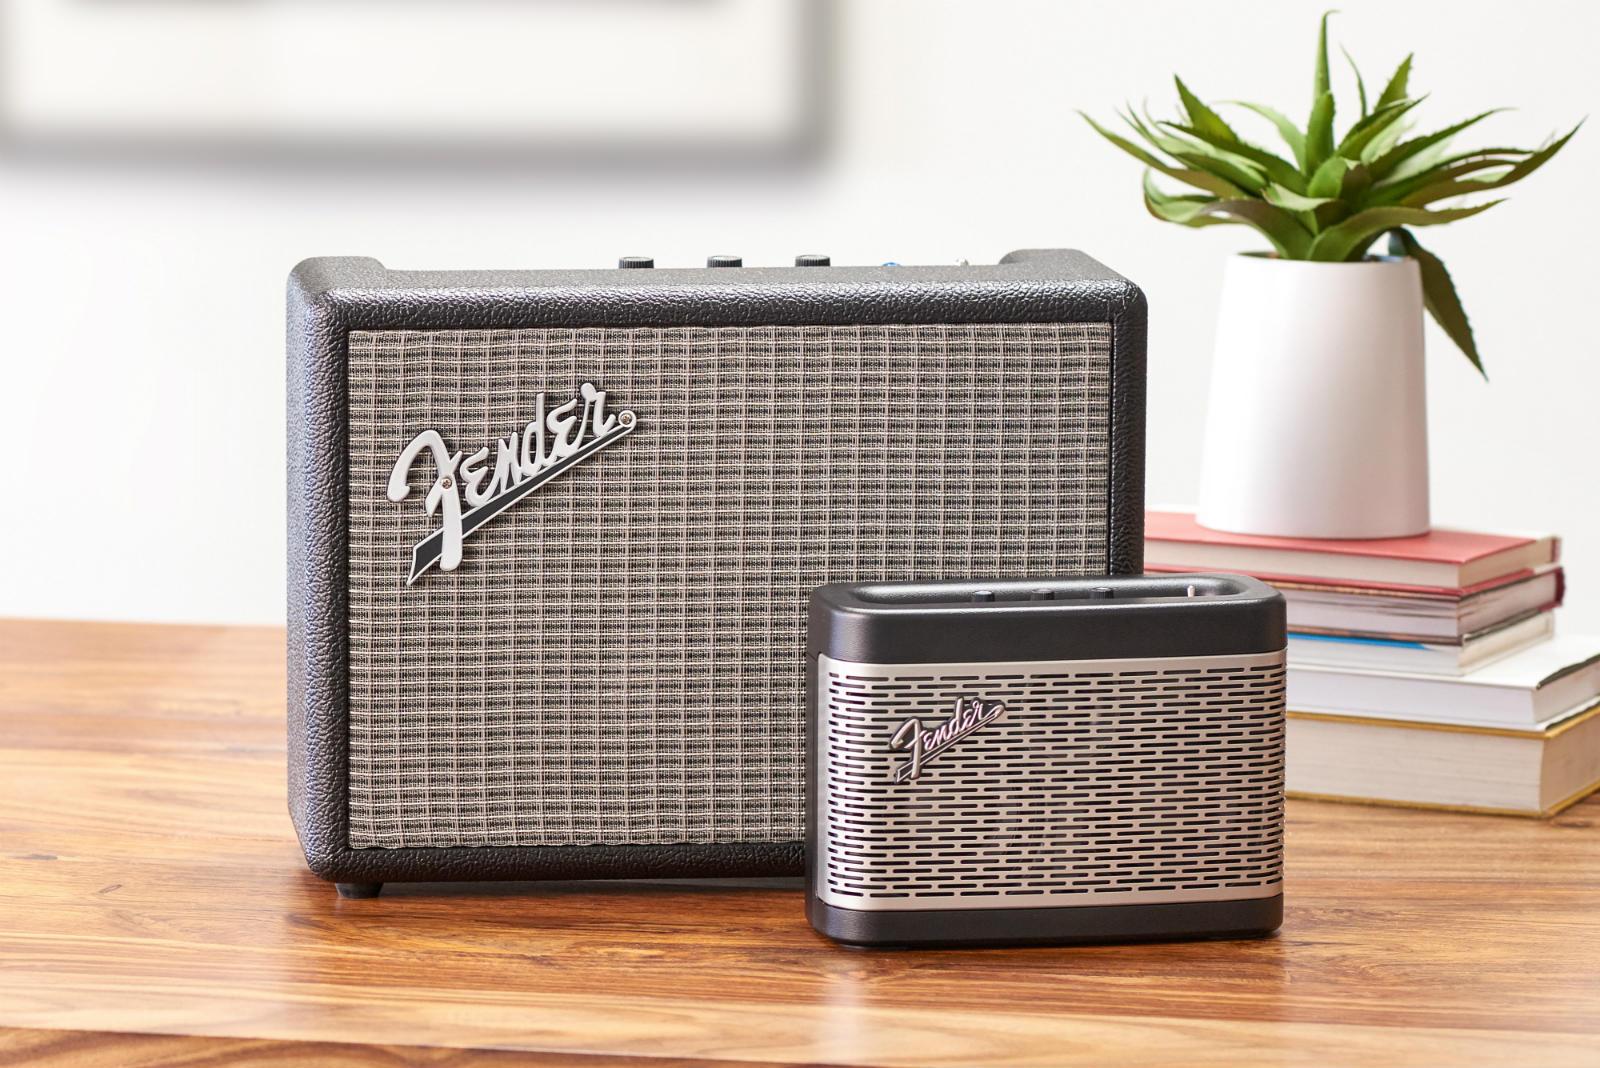 fender 39 s bluetooth speakers look just as you 39 d imagine. Black Bedroom Furniture Sets. Home Design Ideas